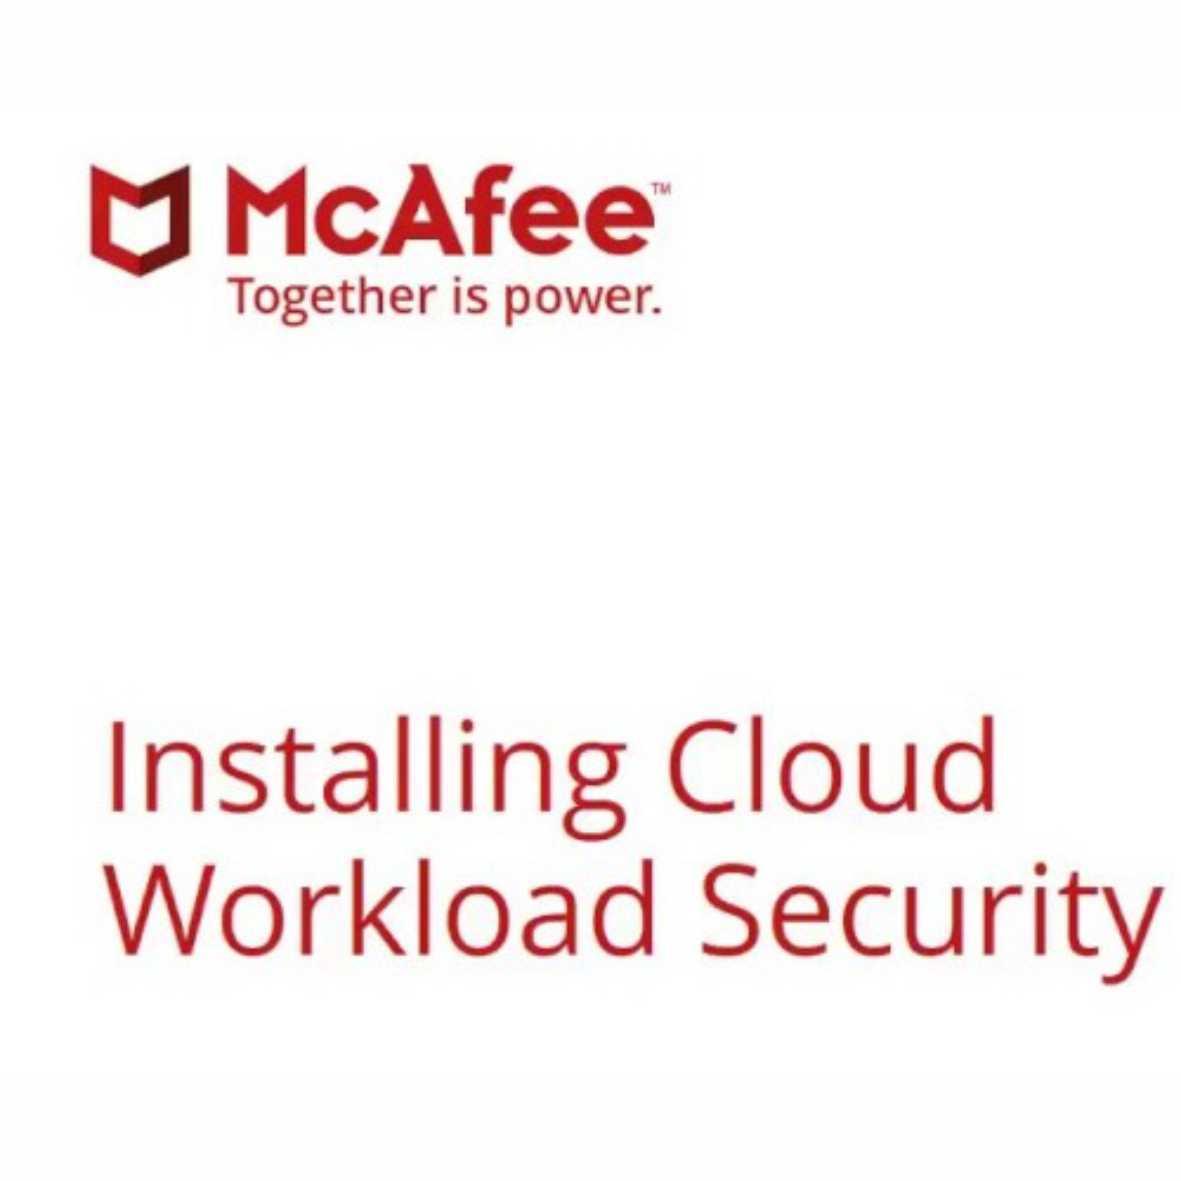 McAfee Cloud Workload Security